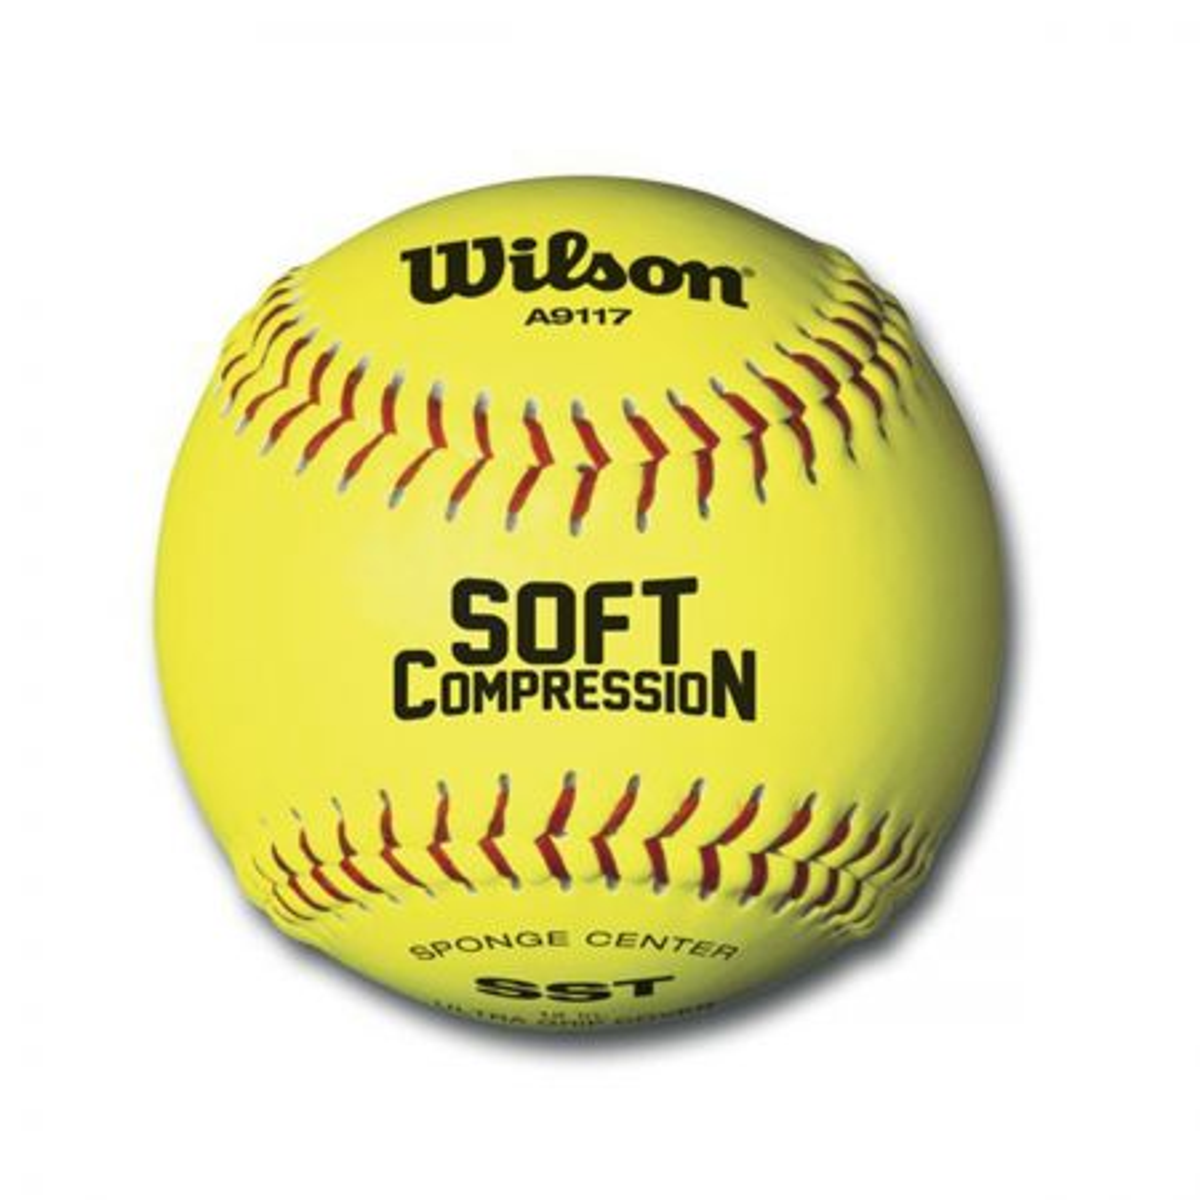 "Wilson Scb 17 12"" softball loptica"